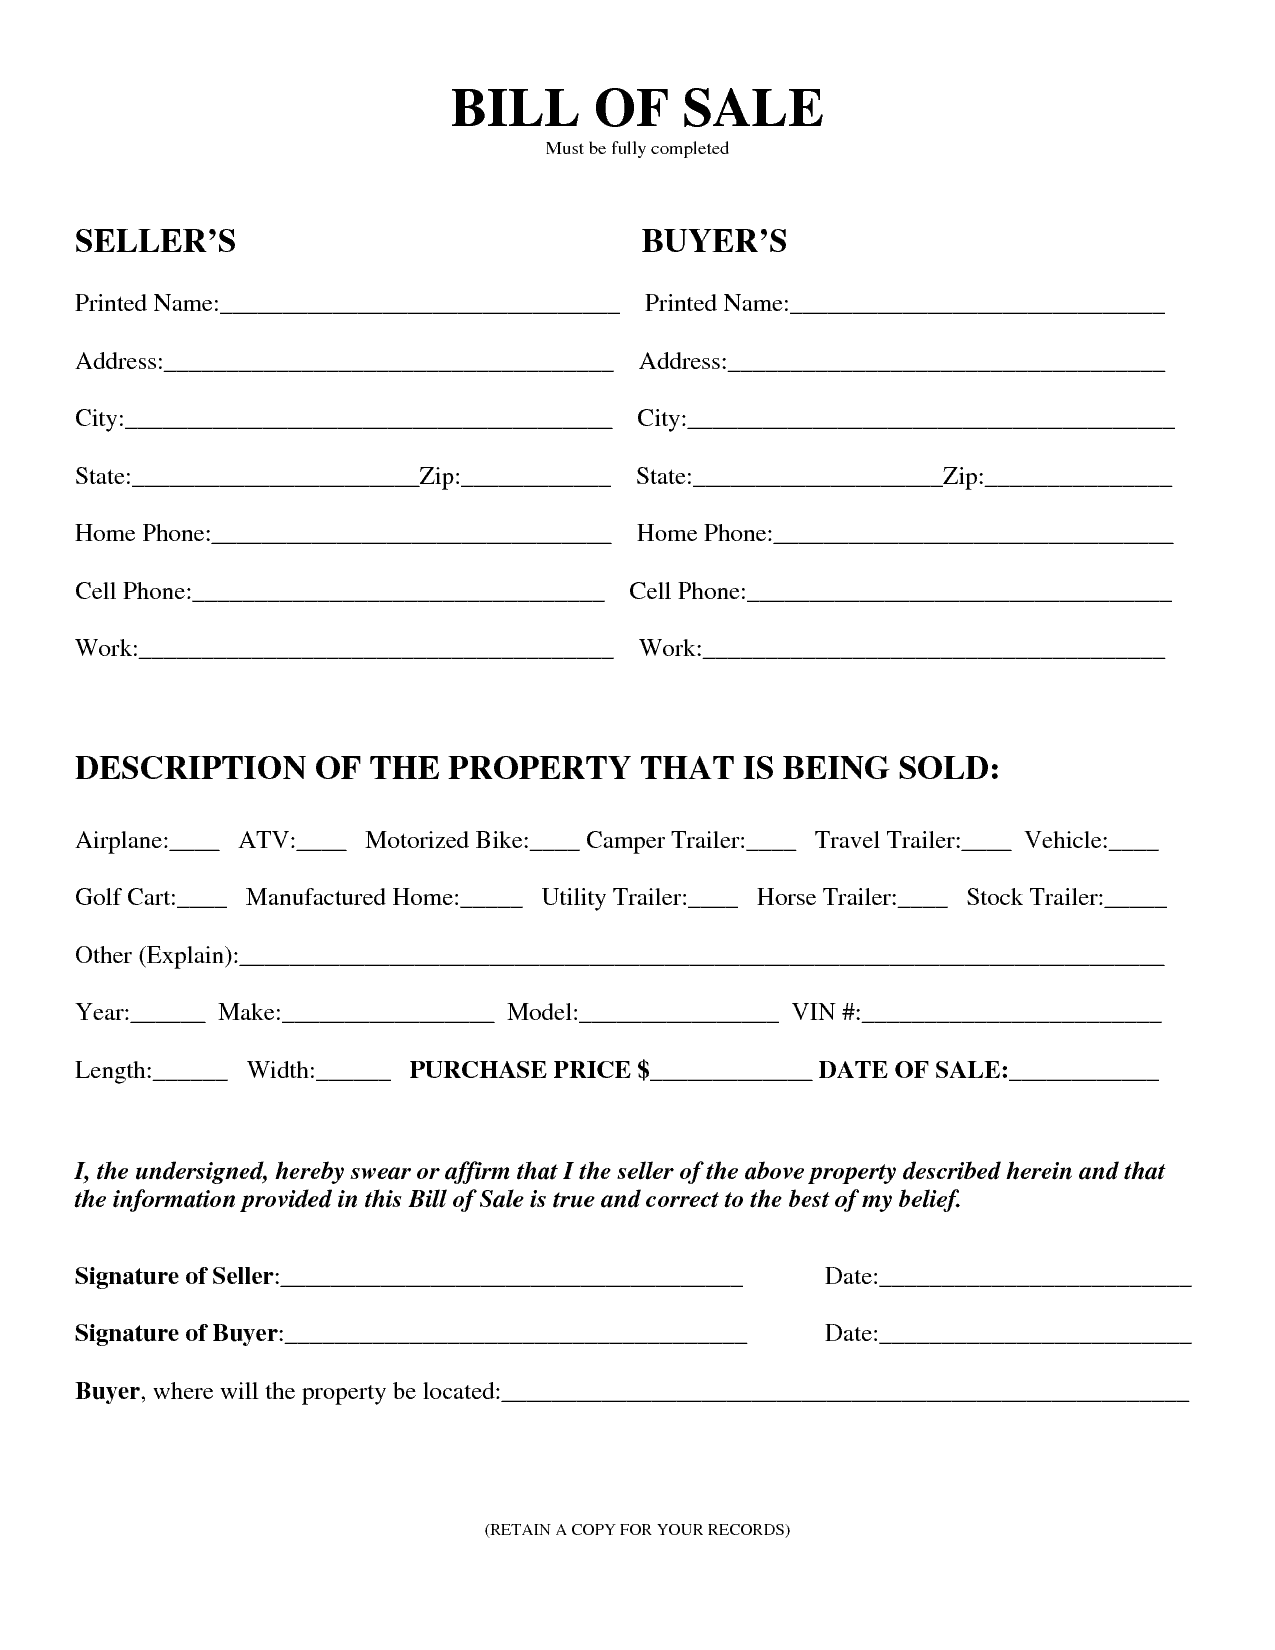 Bill Of Sale Template 22